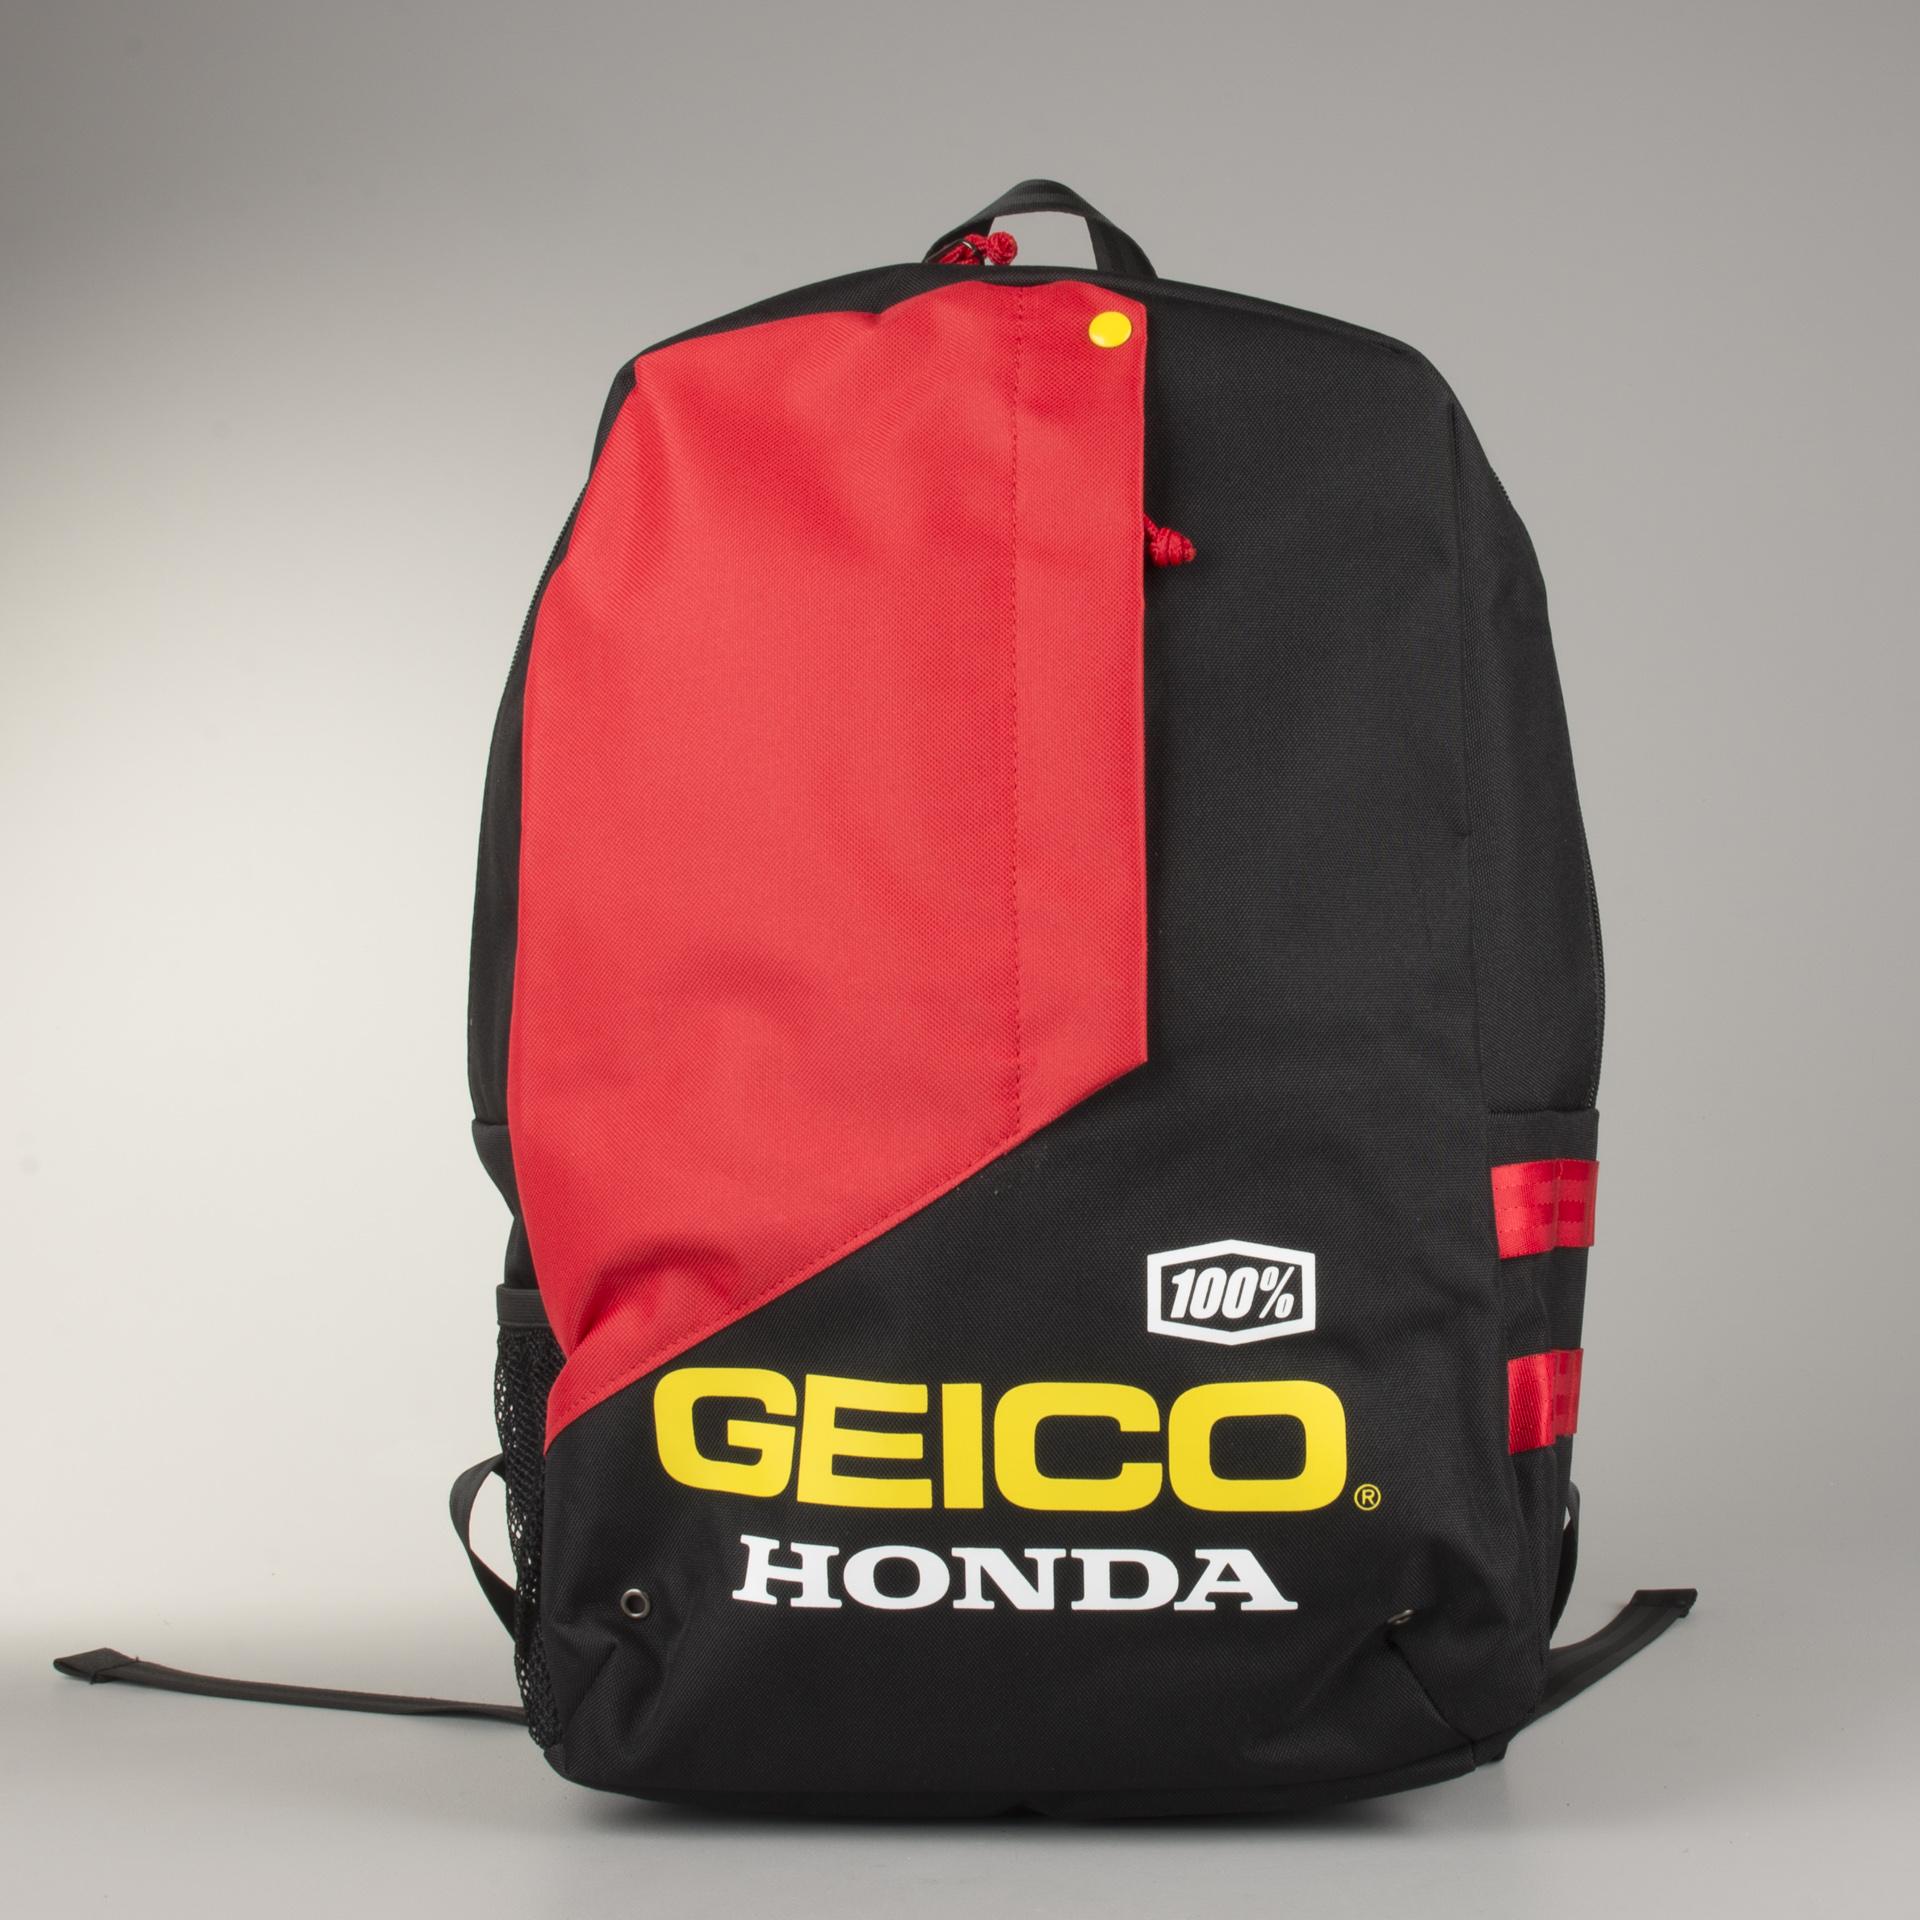 Ryggsäck 100% Geico Honda Haversack Svart Nu 20% rabatt